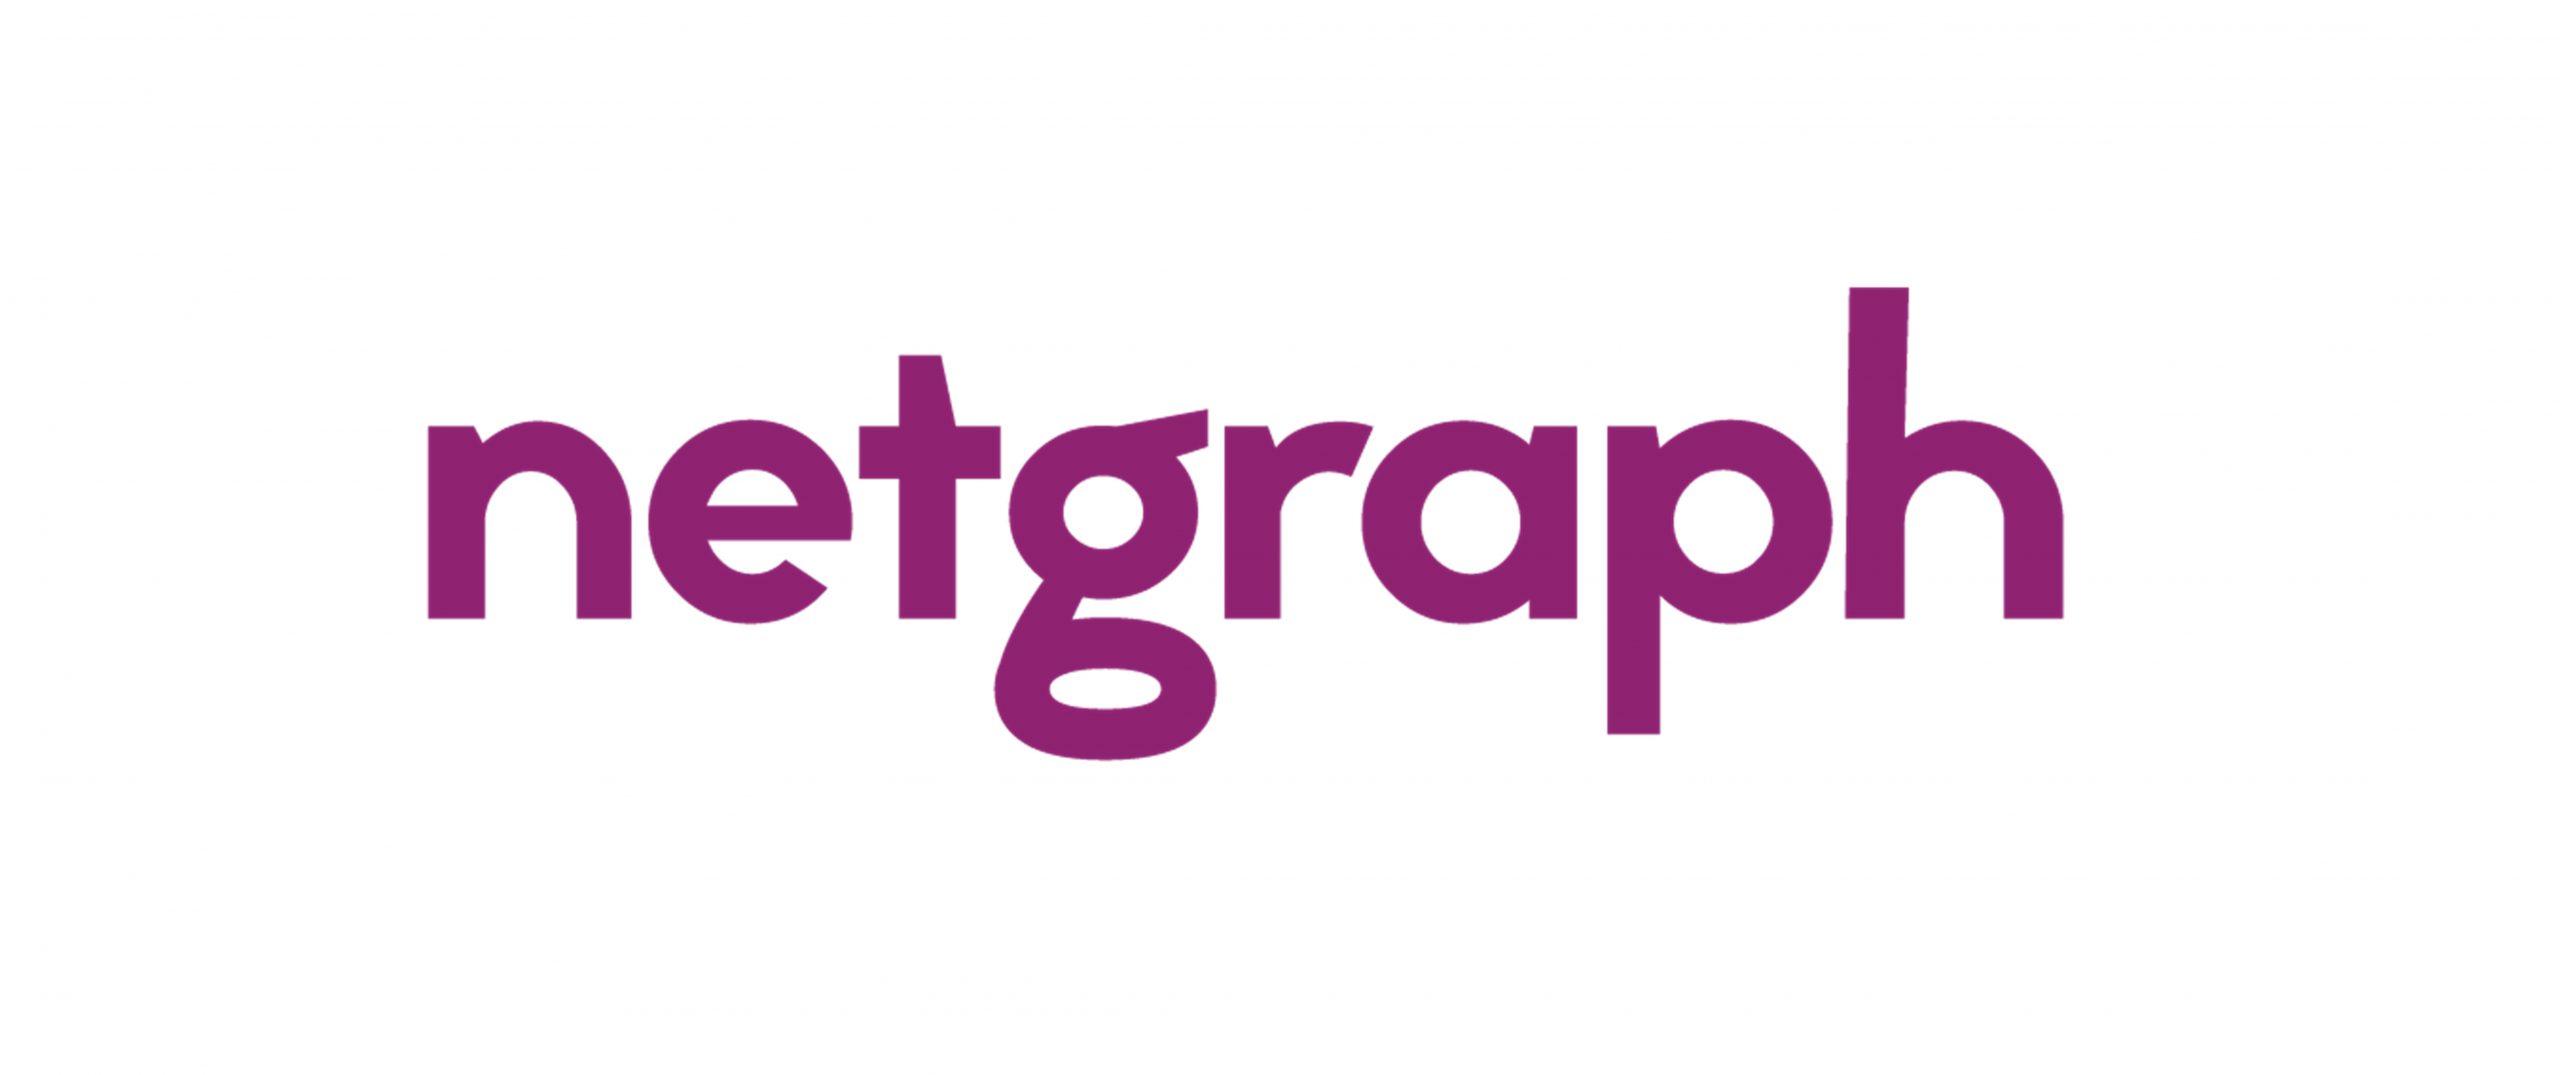 Netgraph